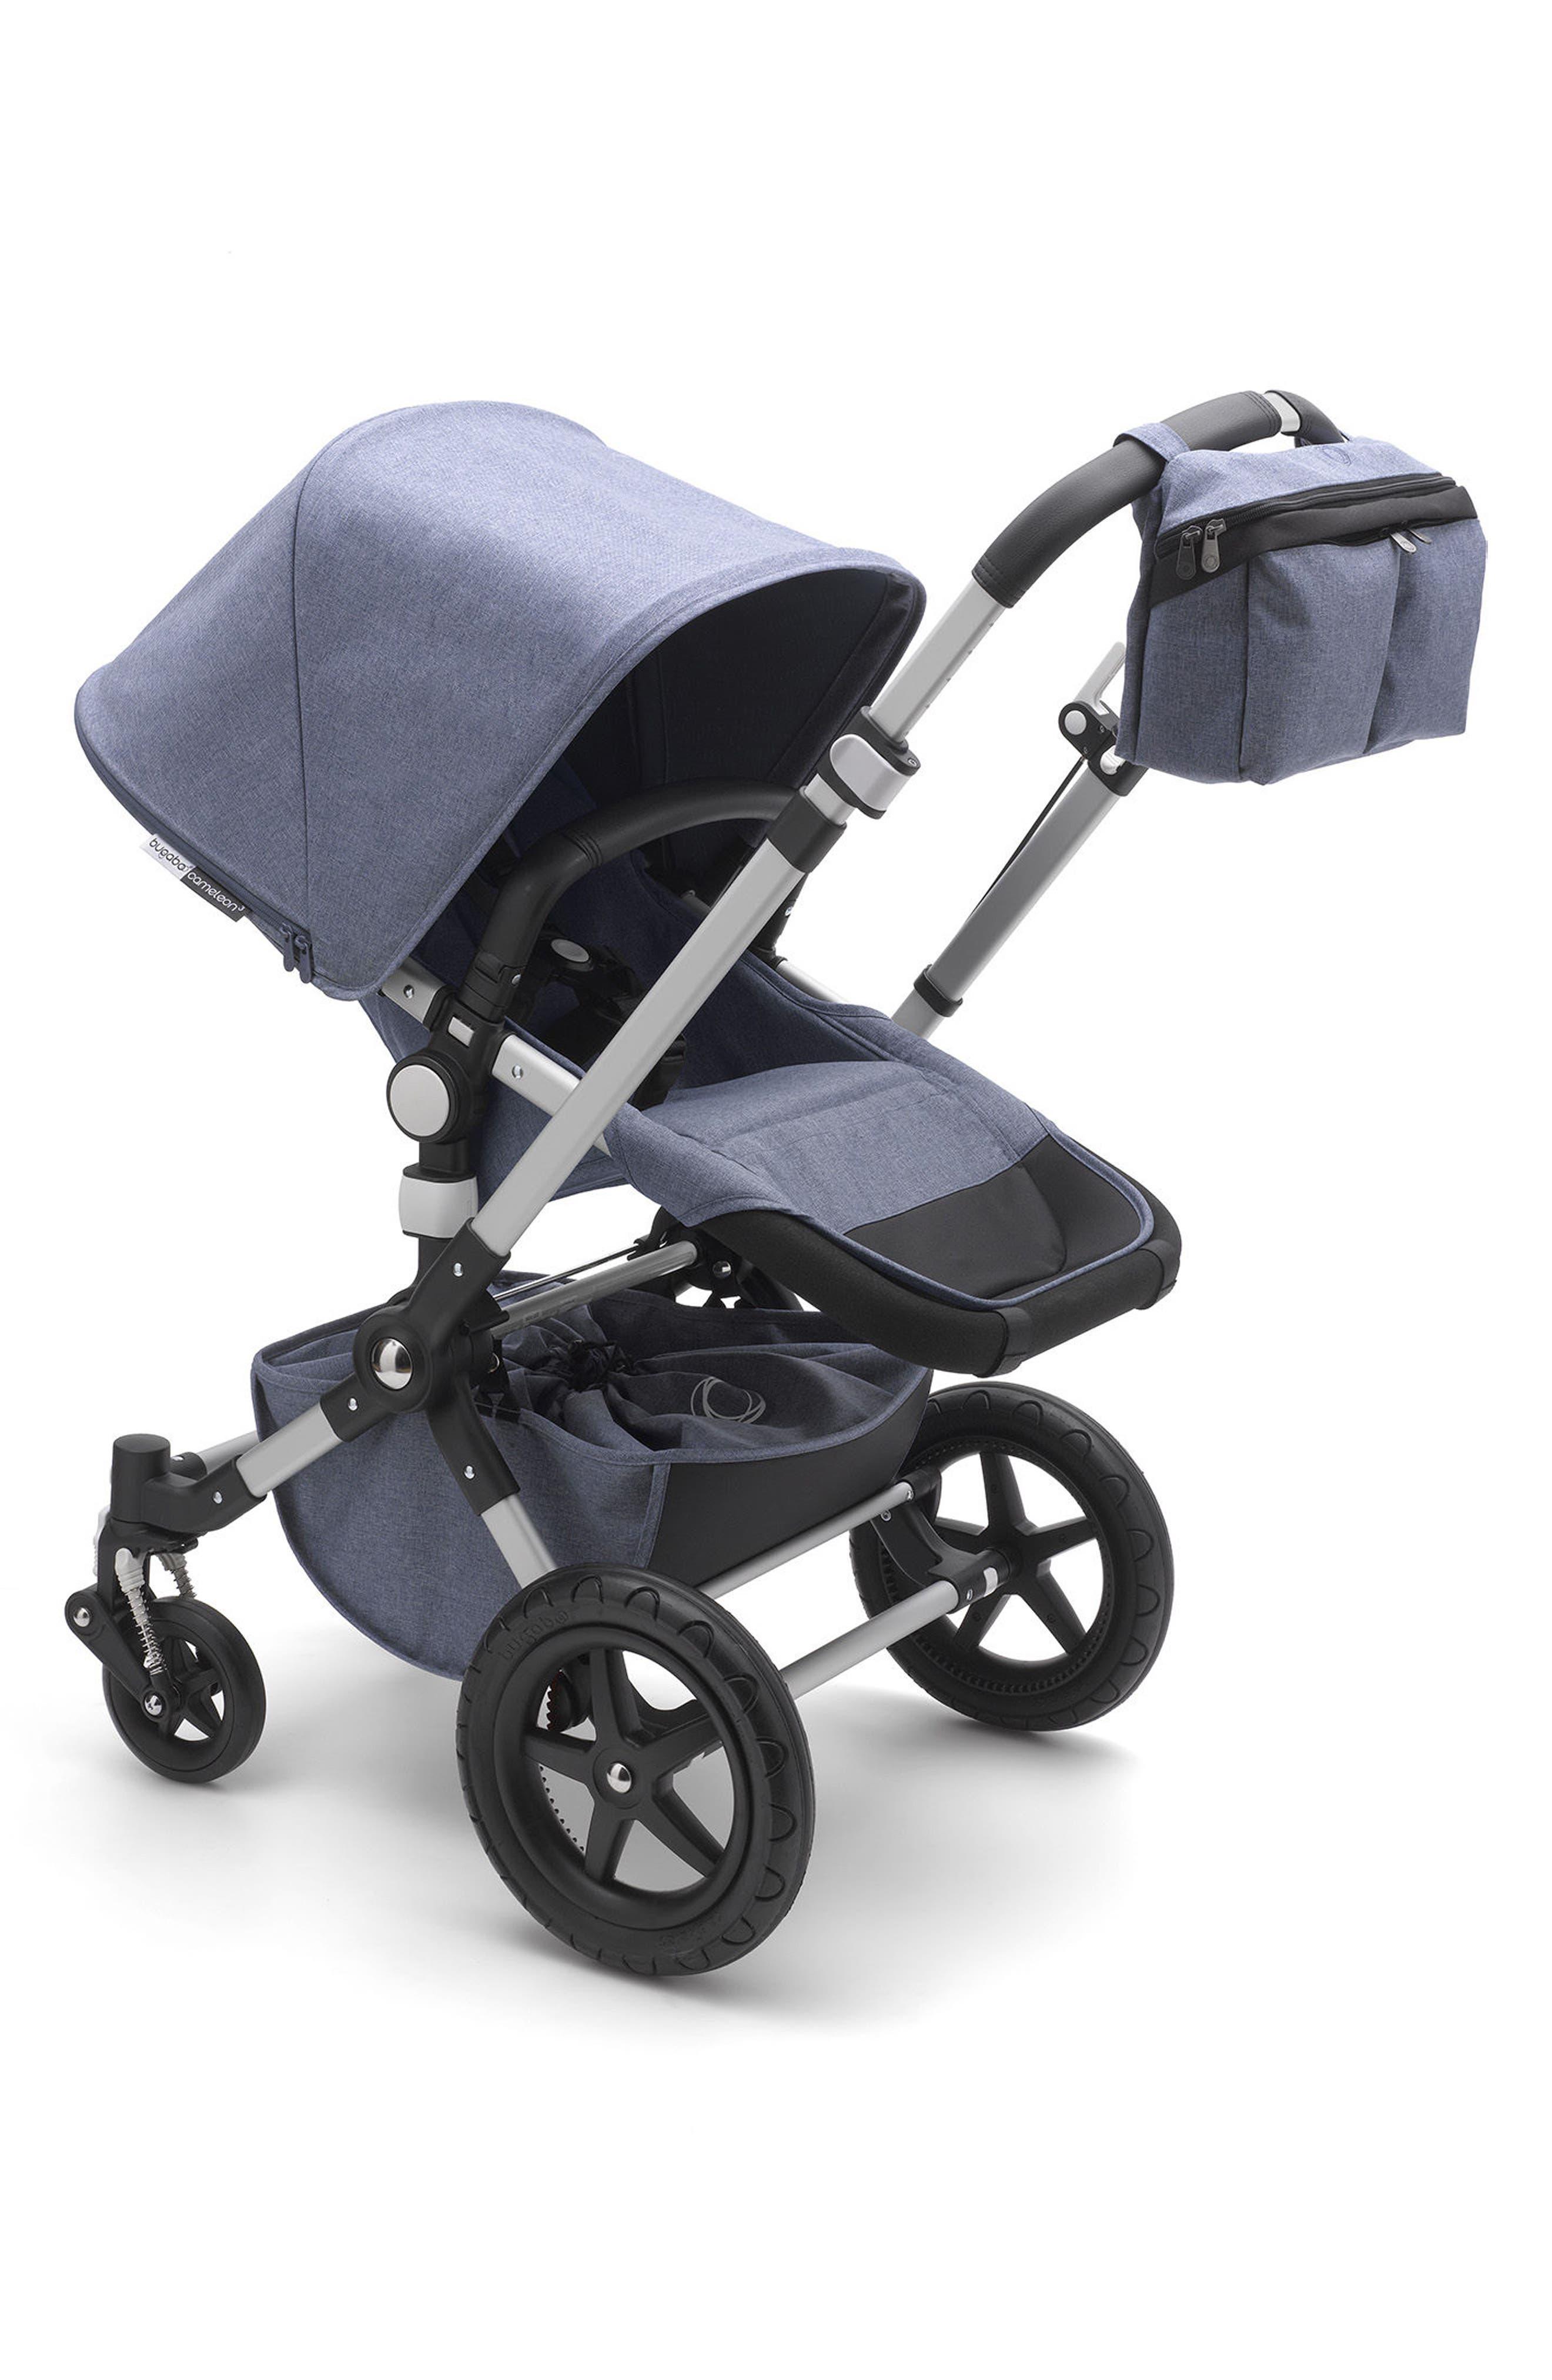 Main Image - Bugaboo Cameleon³ Fresh Collection Stroller